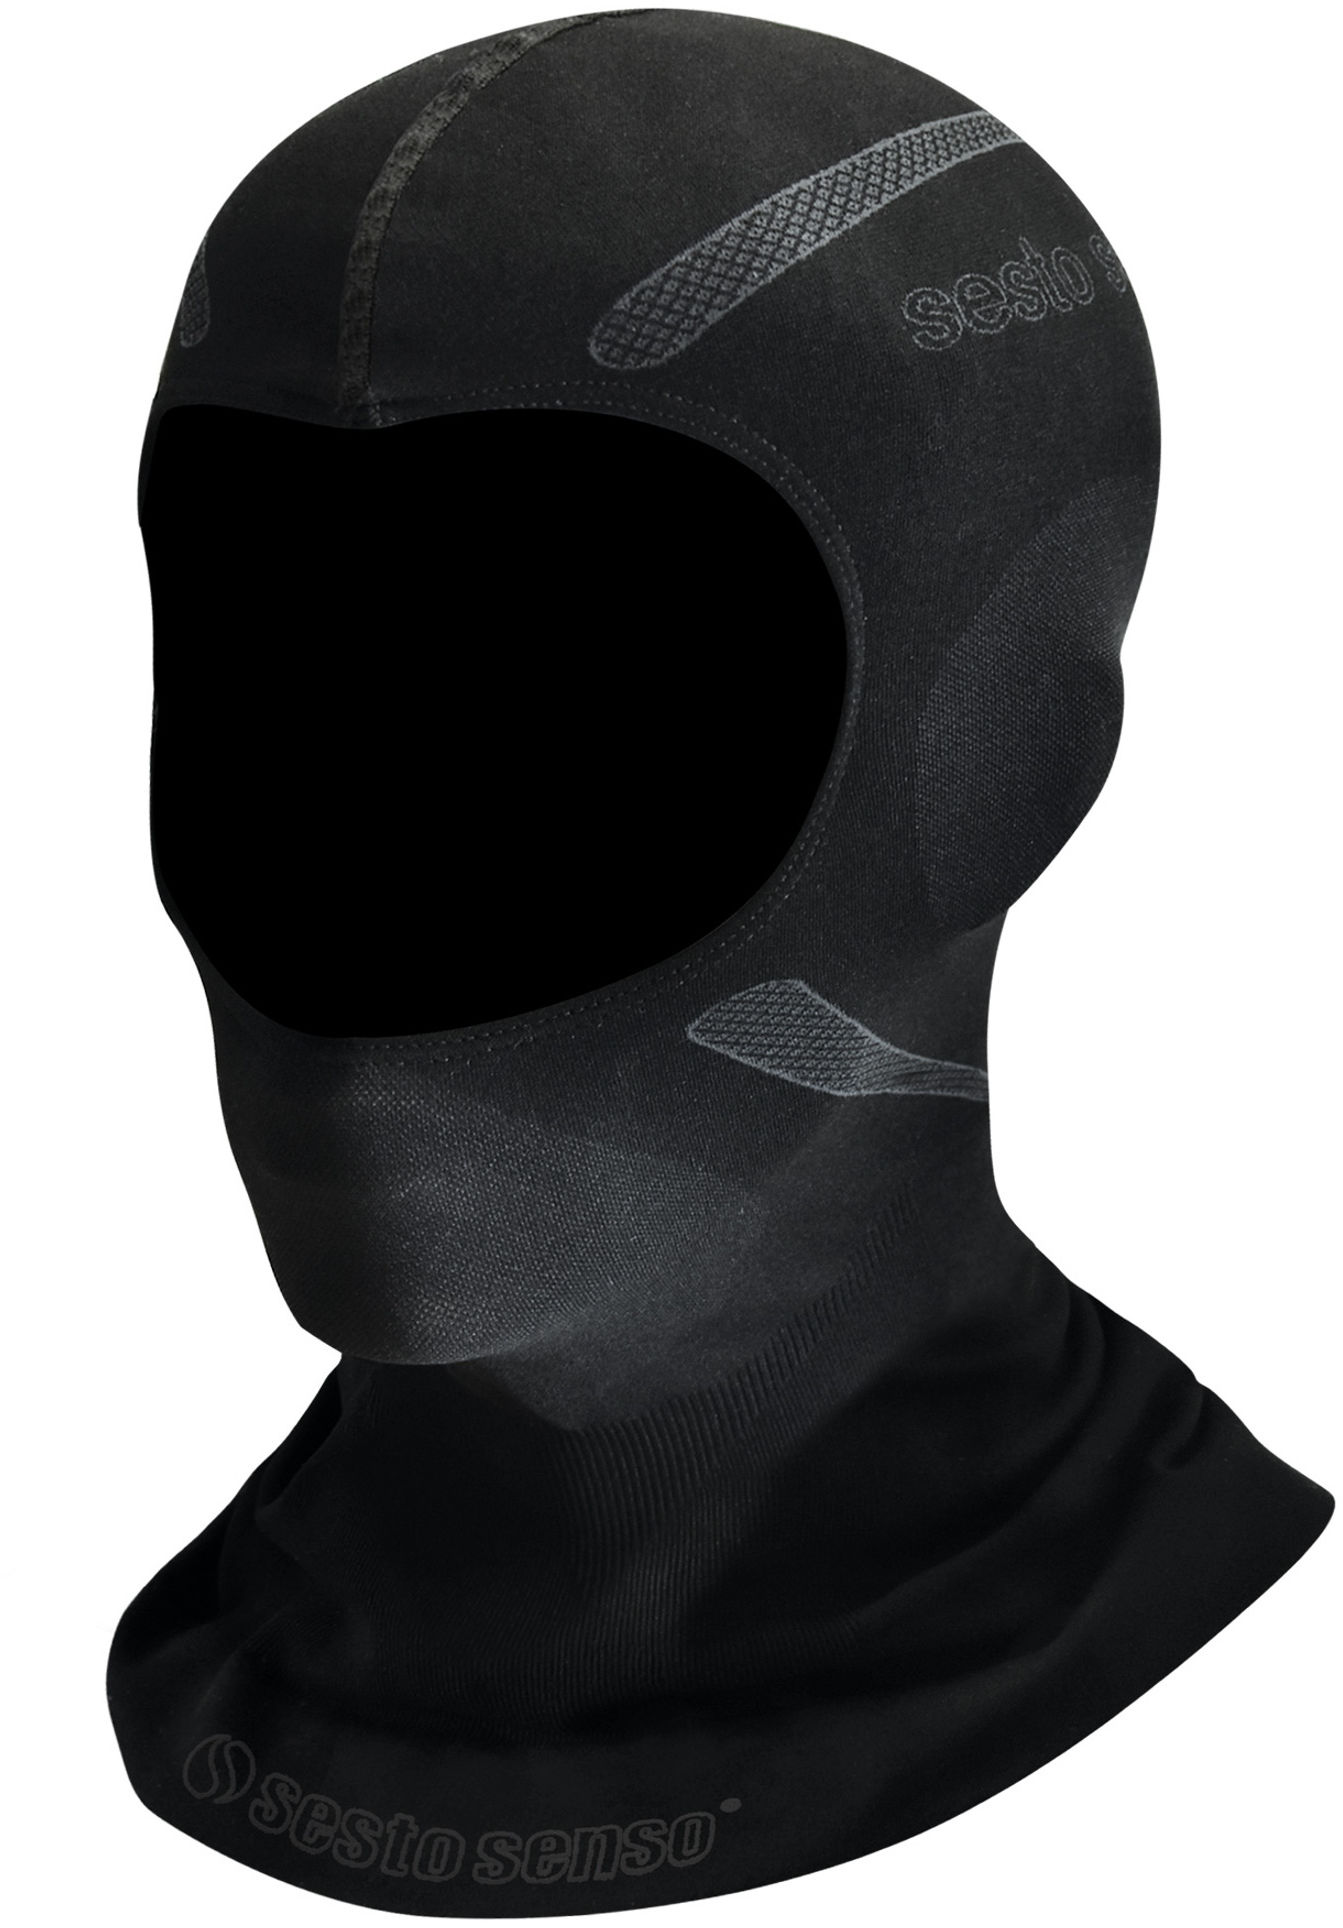 Kominiarka Termoaktywna THERMO ACTIVE, czarna, idealnie dopasowana